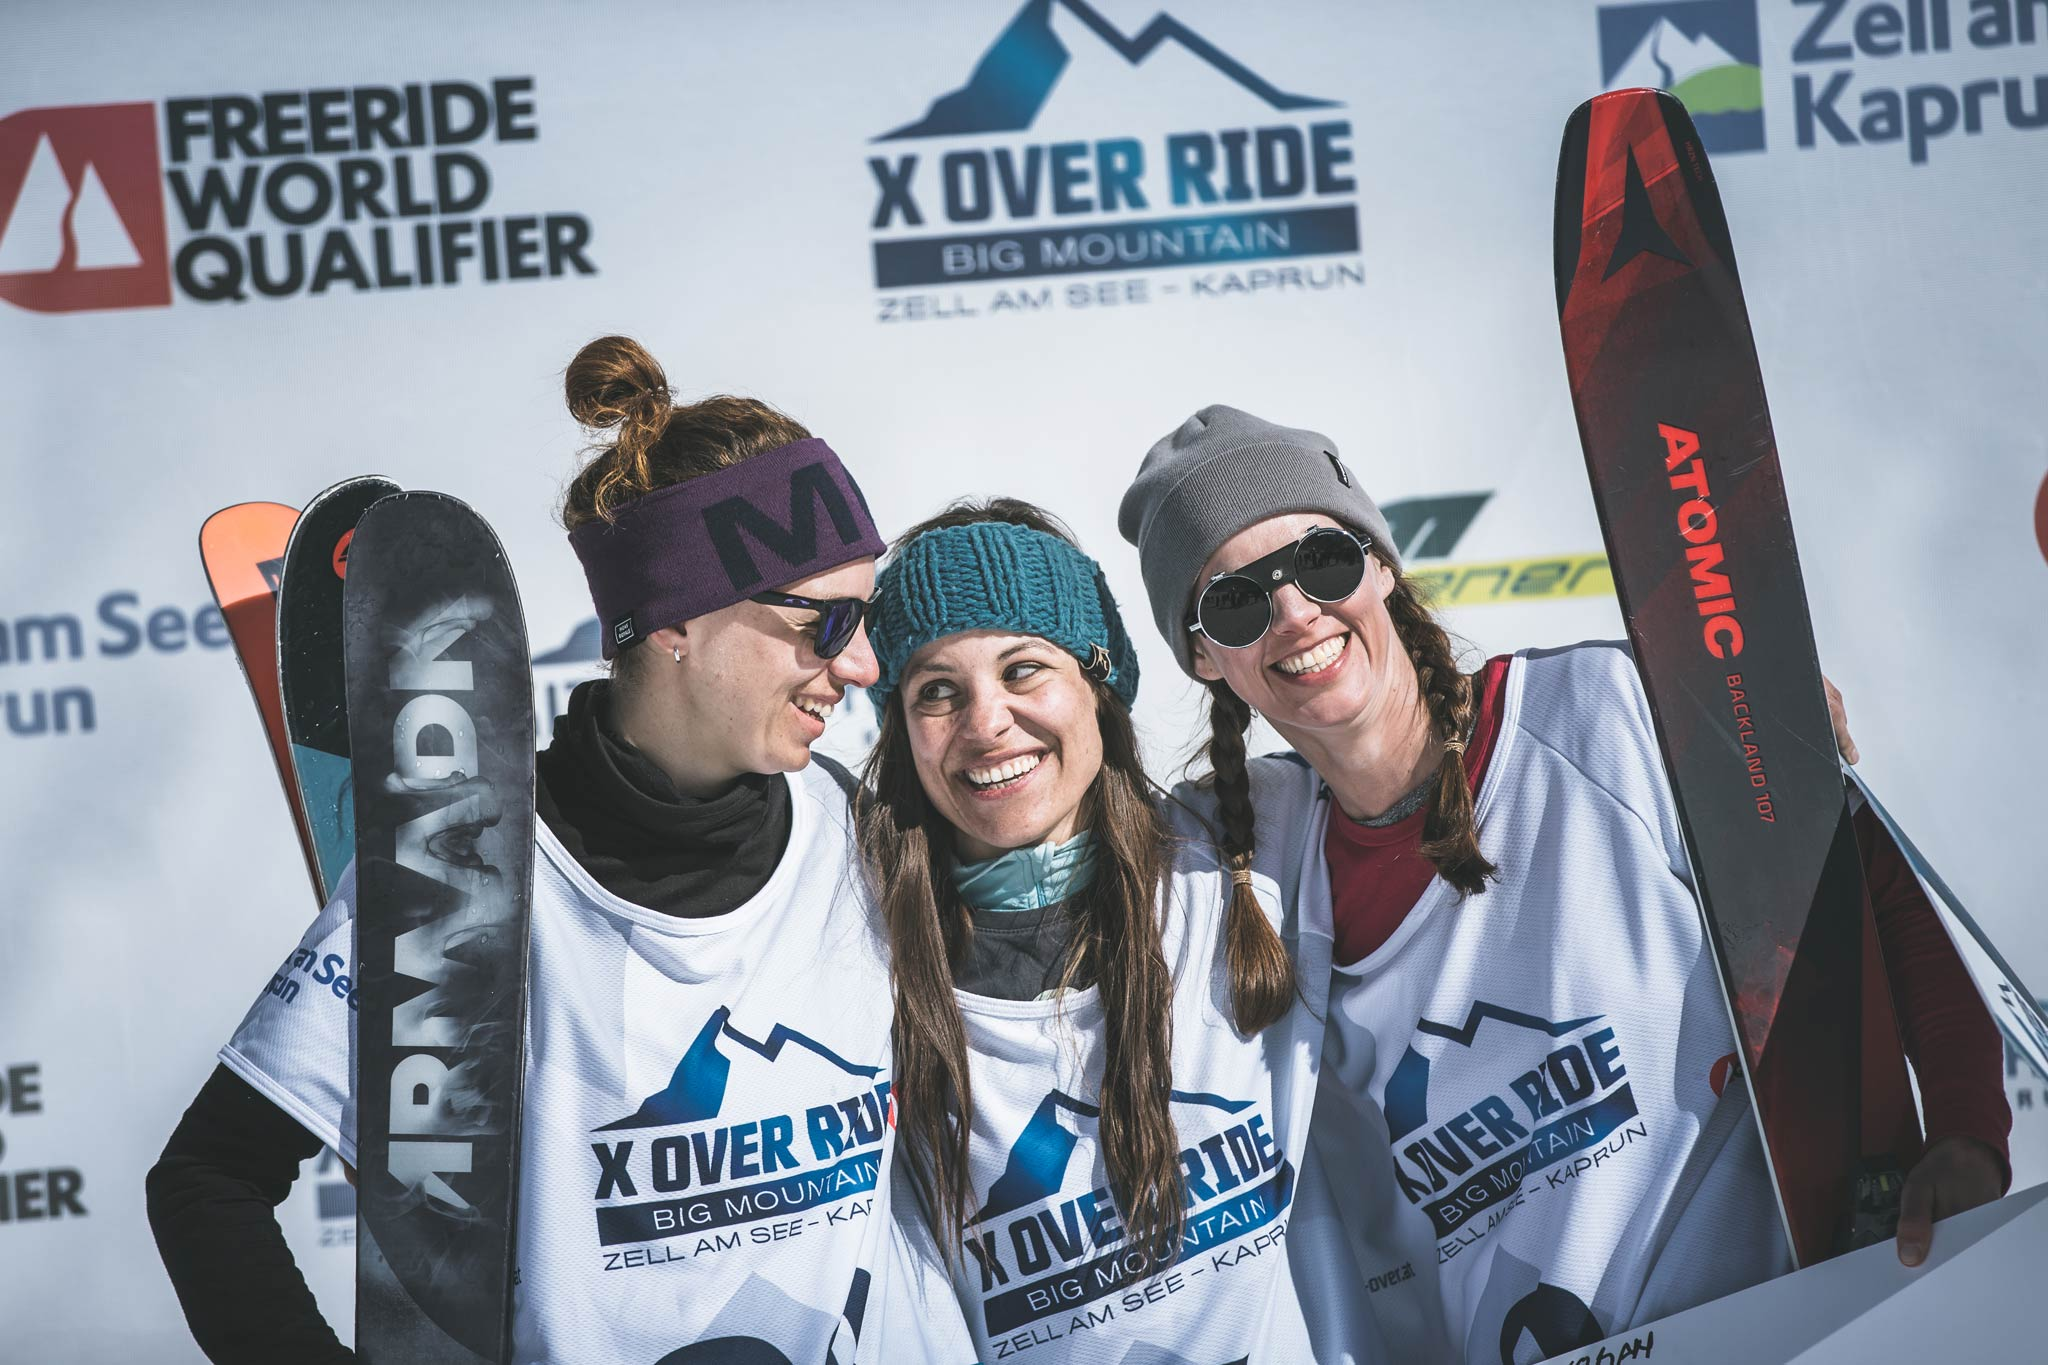 Die drei besten Frauen beim X Over Ride 2019 am Kitzsteinhorn: Jacoba Kriechmayr (AUT), Claudia Klobasa (AUT) & Katerina Kalinova (CZE) (v.l.n.r.)- Foto: Mia Knoll